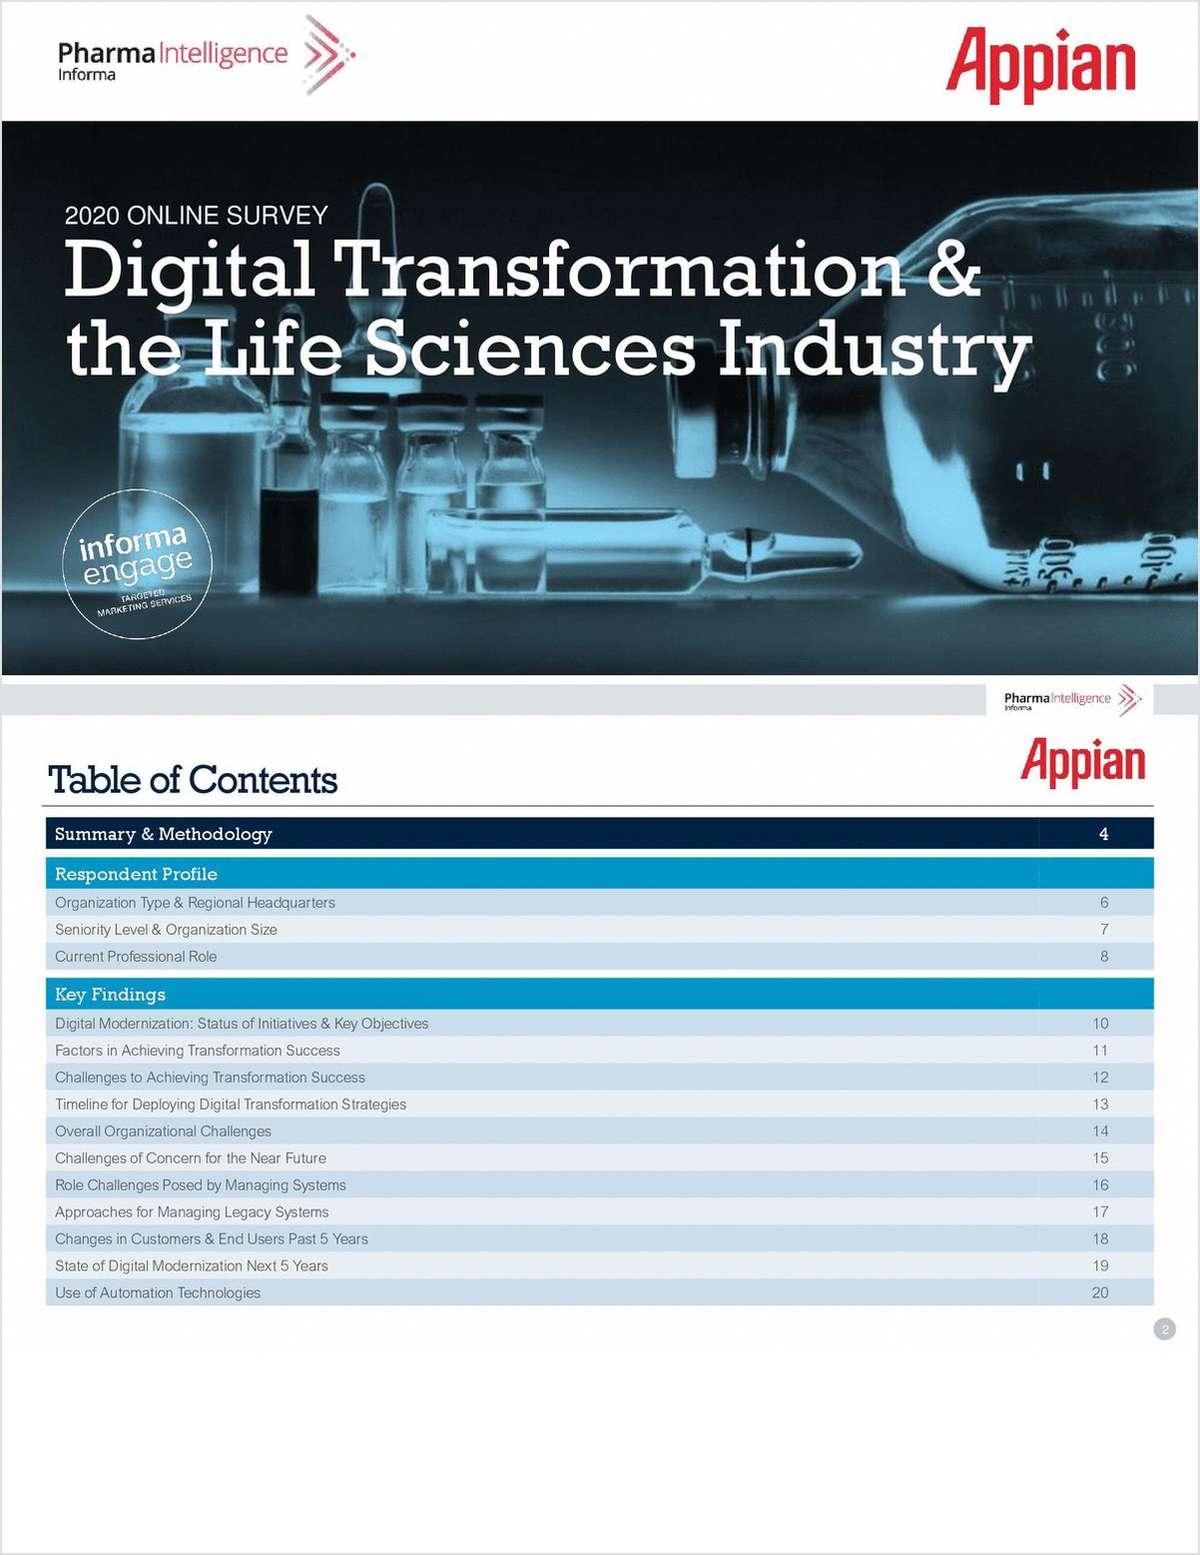 2020 Online Survey: Digital Transformation & the Life Sciences Industry